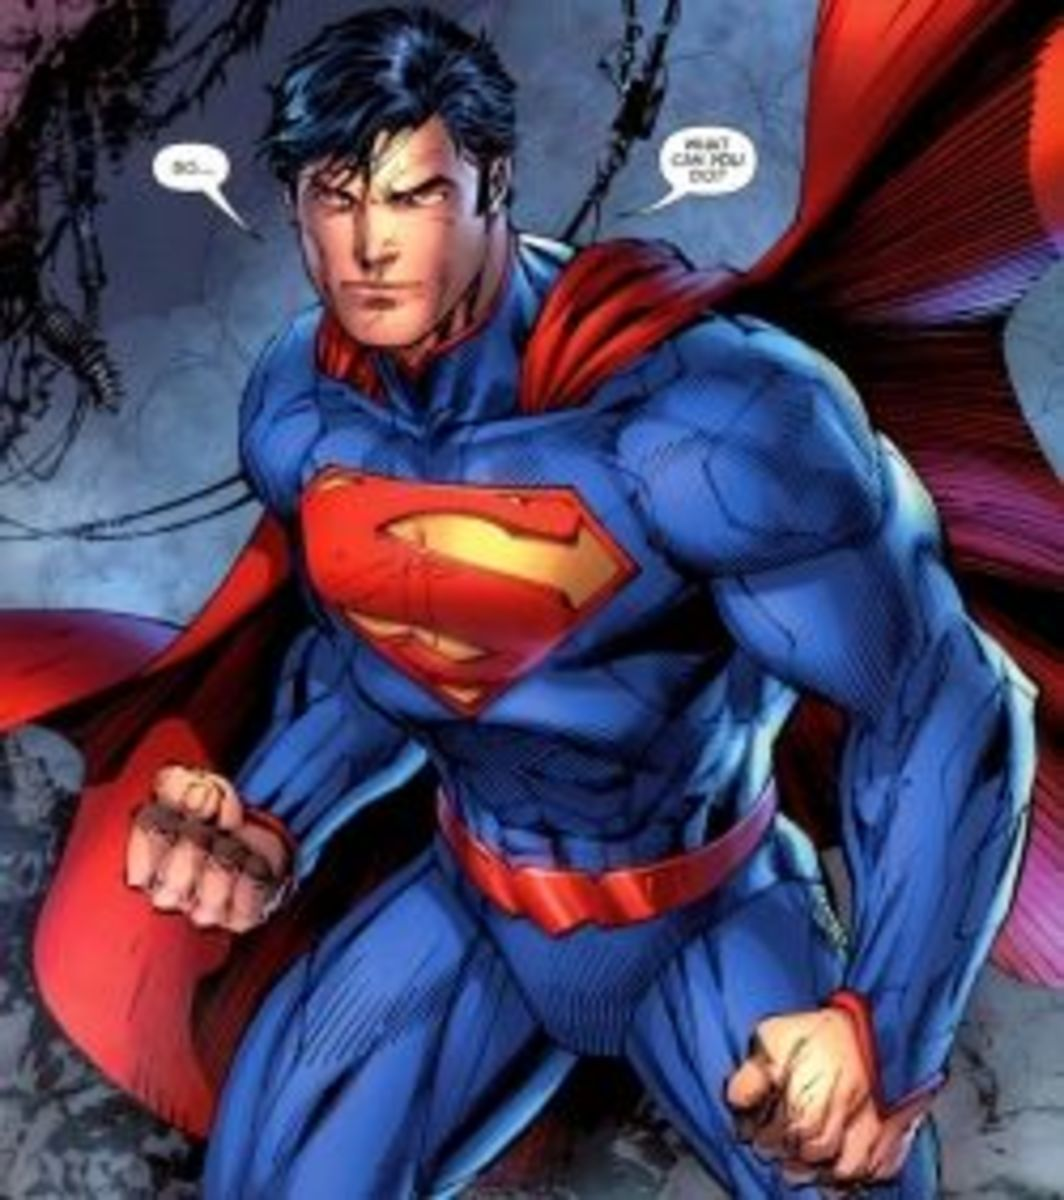 Justice League #1: Meet Superman.